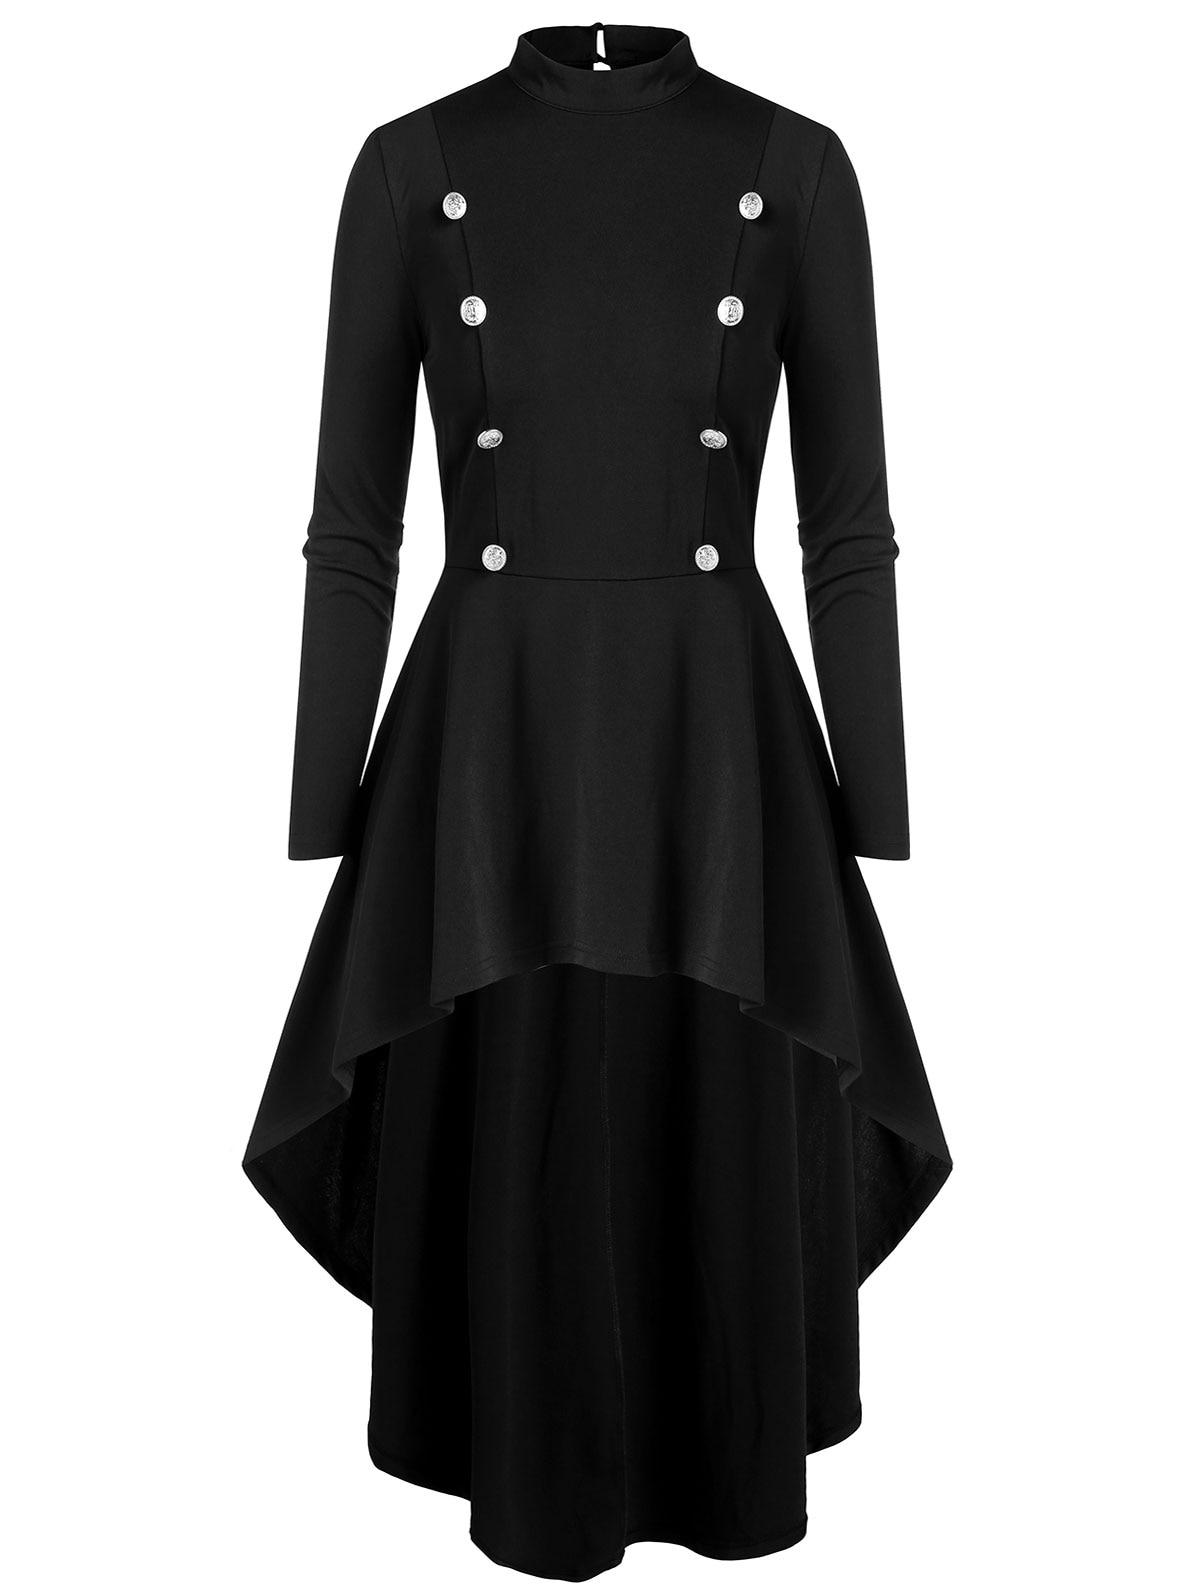 ROSEGAL Plus Size Fall Winter Gothic Coat Dress Women High Low Outerwear Fashion High Neck Long Shirt Tops Retro Overcoat Trench